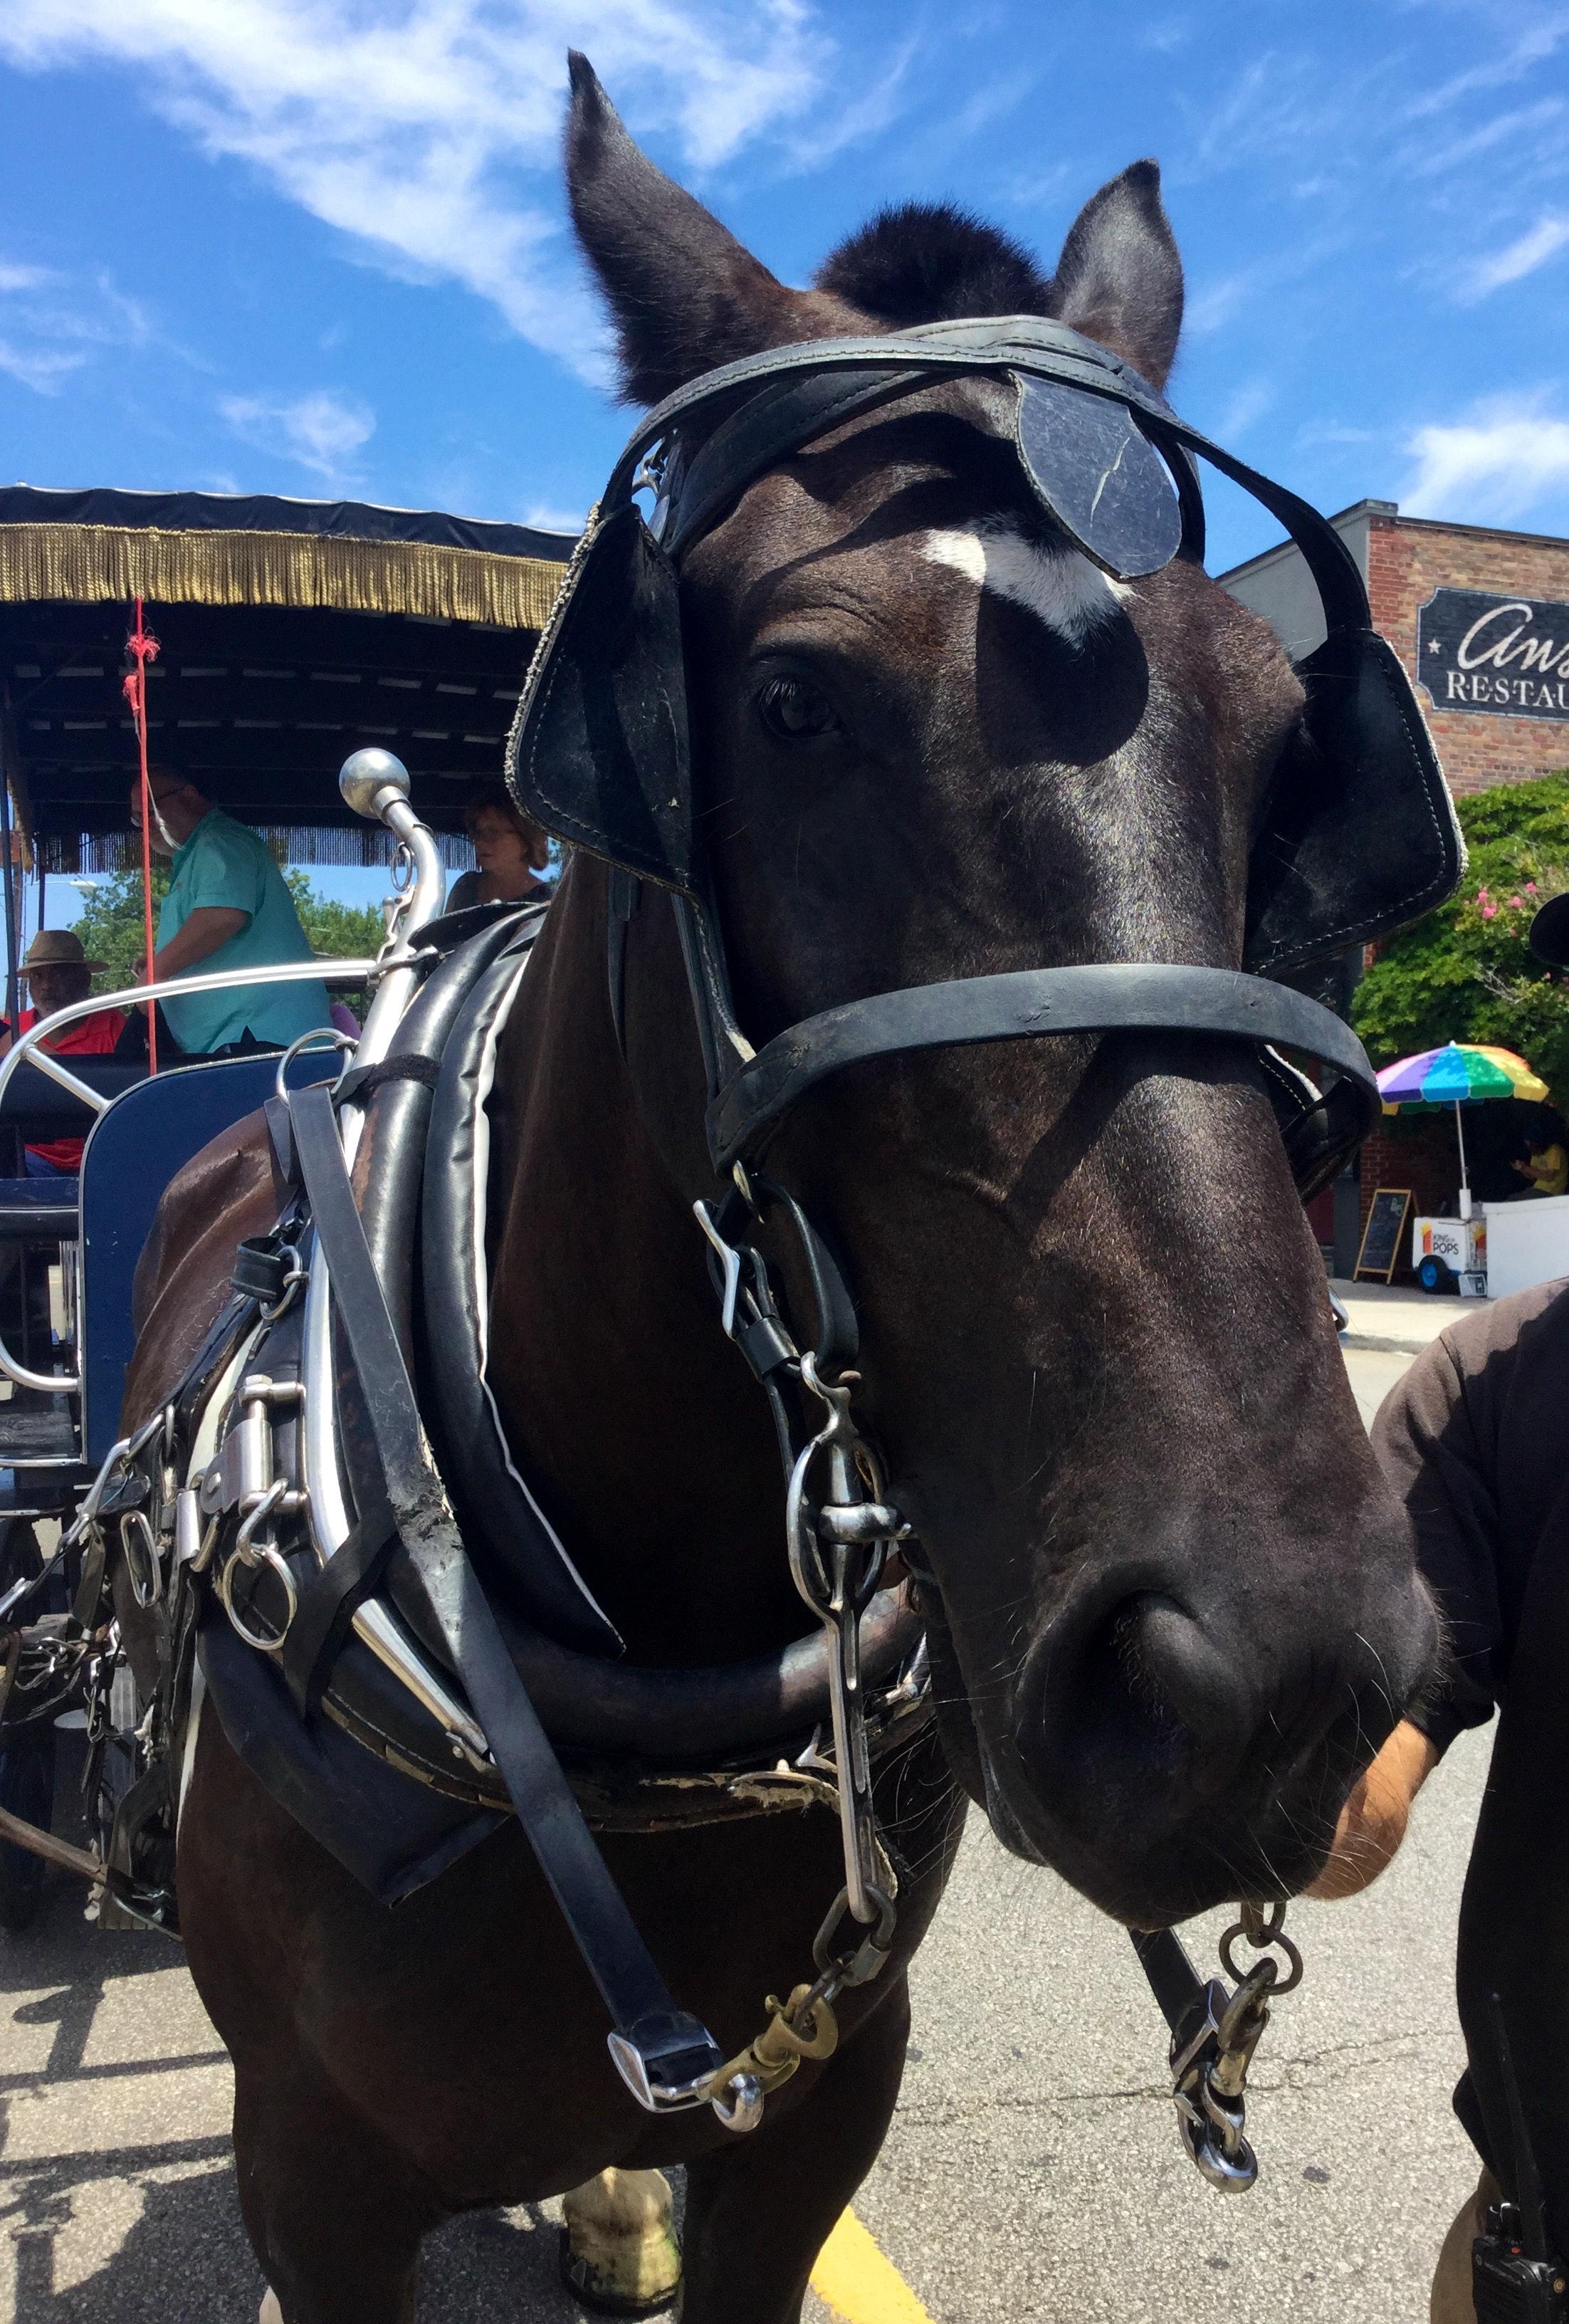 Rembrandt, Carolina Carriage Horse